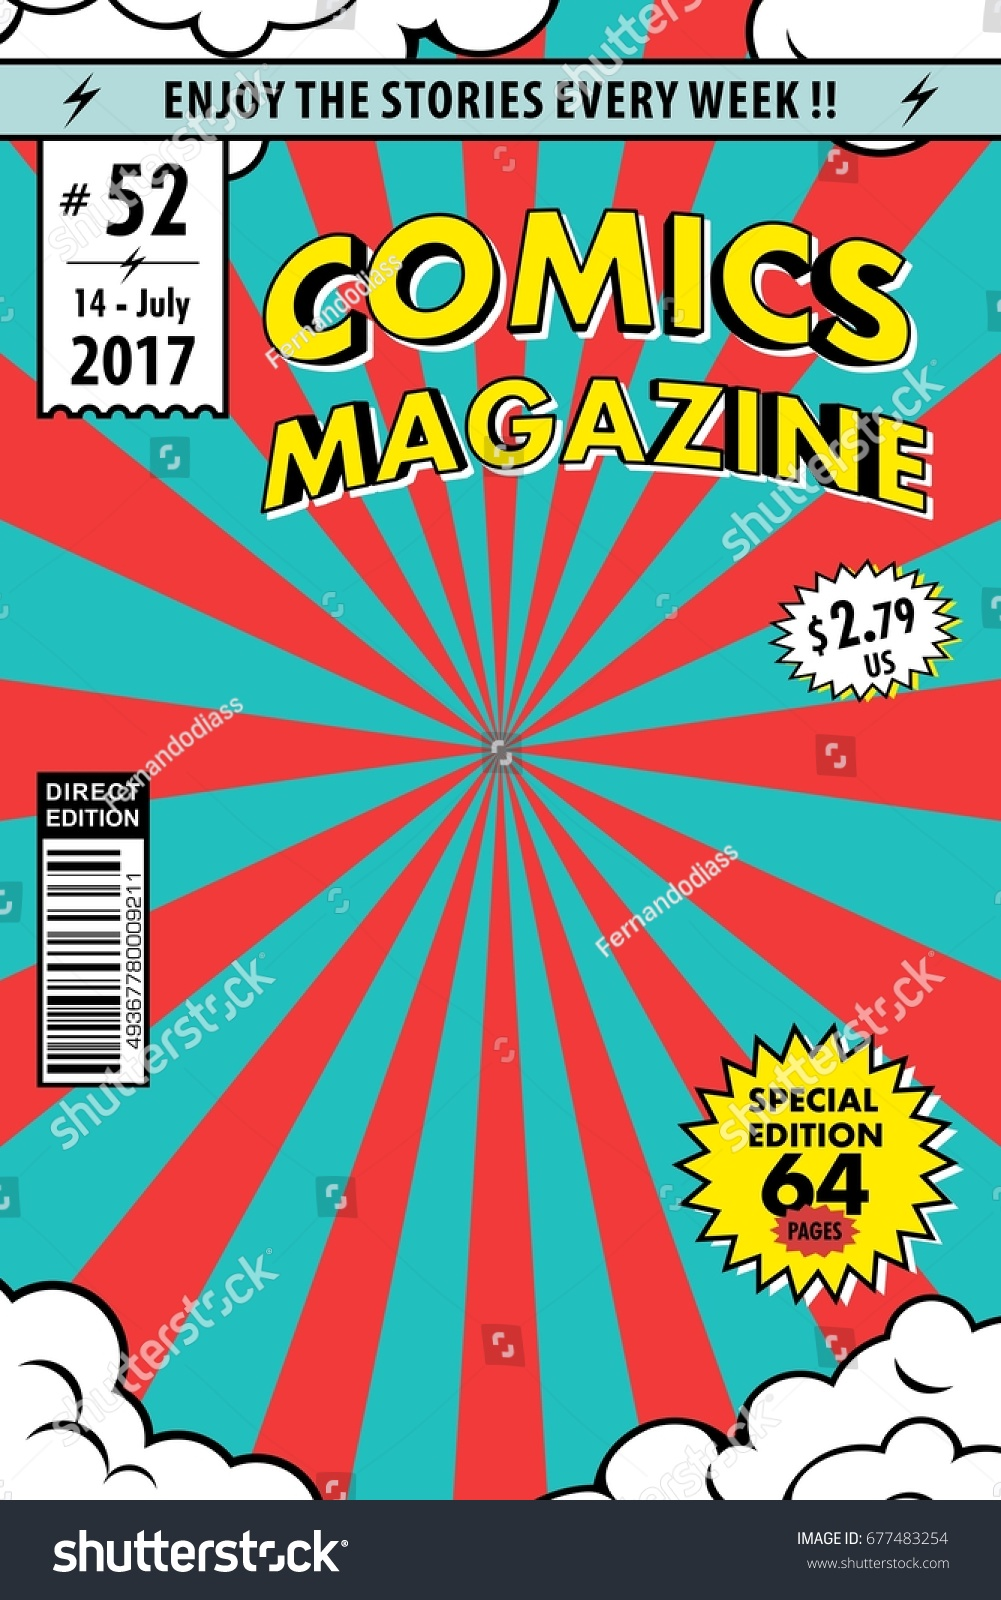 comic book cover template magazine vector stock vector 677483254 shutterstock. Black Bedroom Furniture Sets. Home Design Ideas